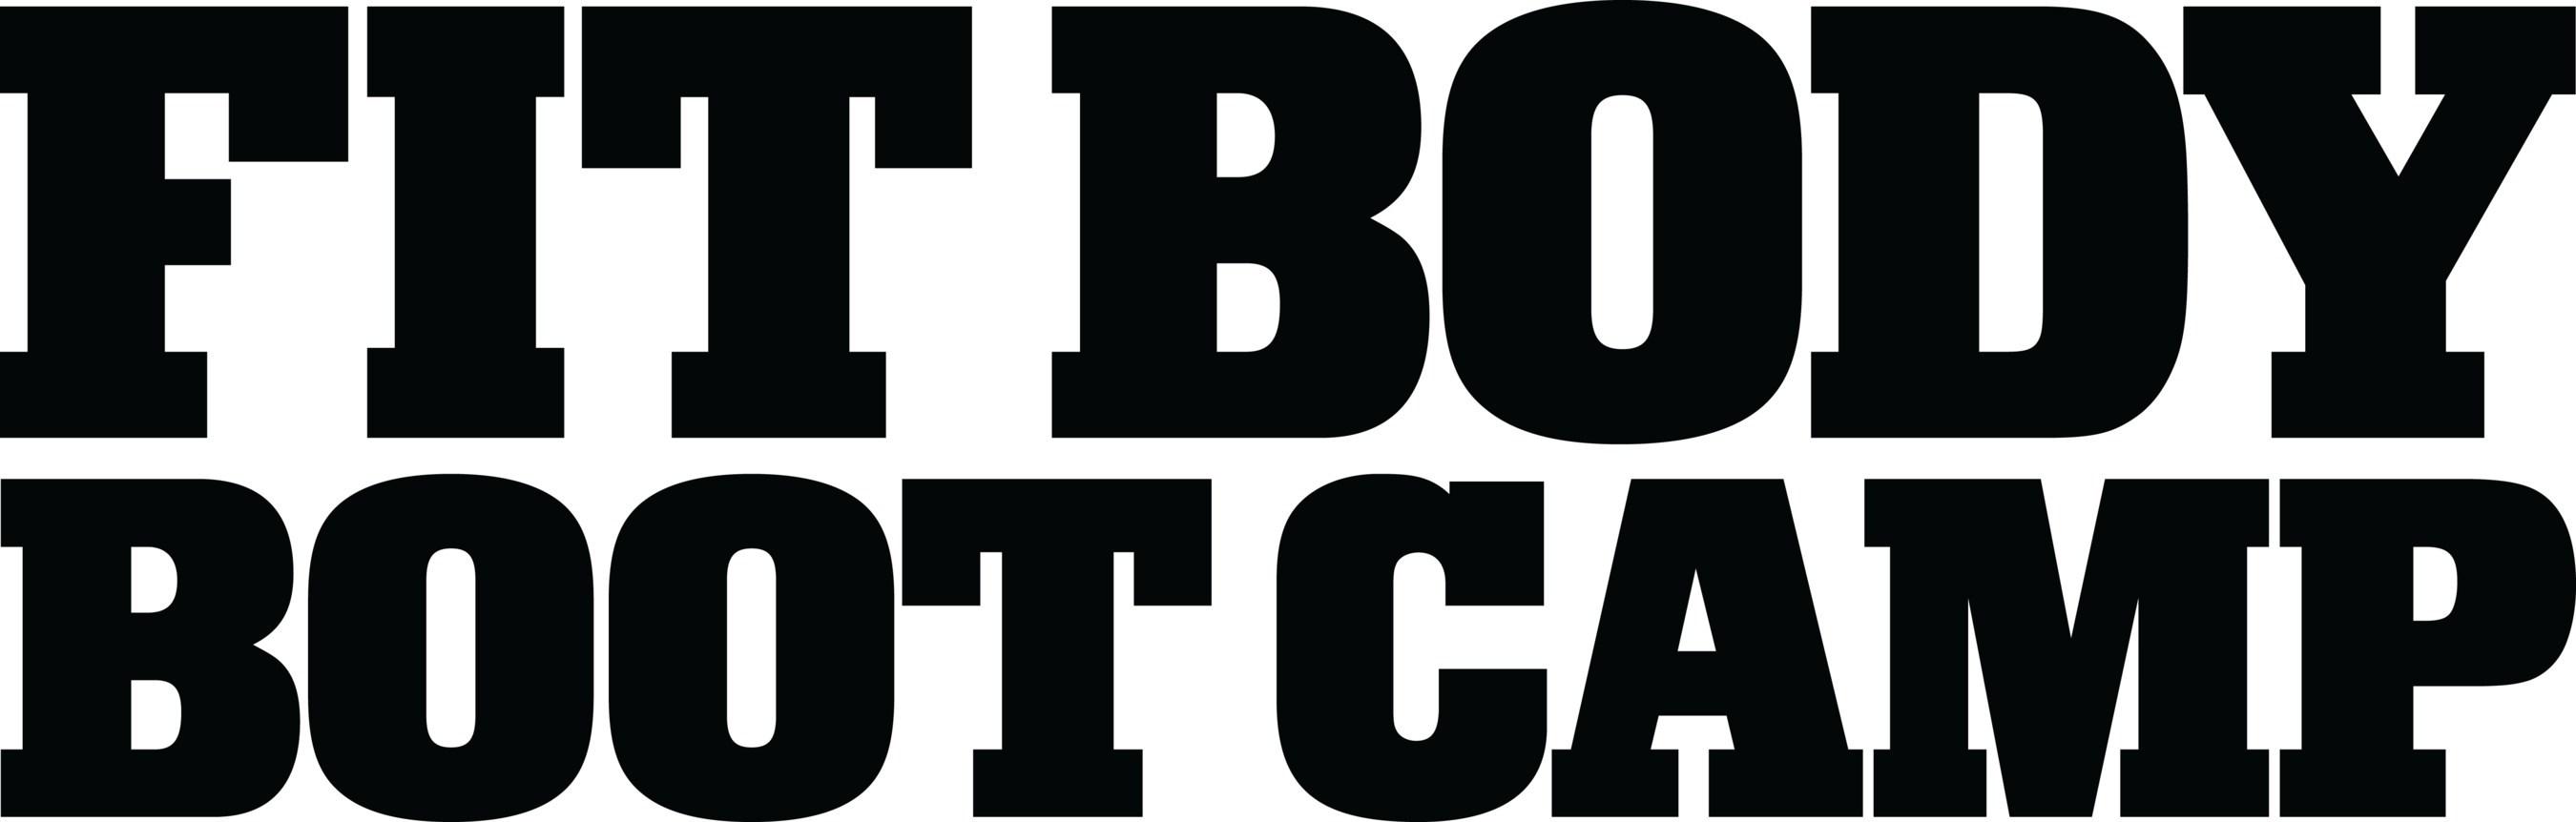 Fit Body Boot Camp Surpasses 700 Franchises through Social.